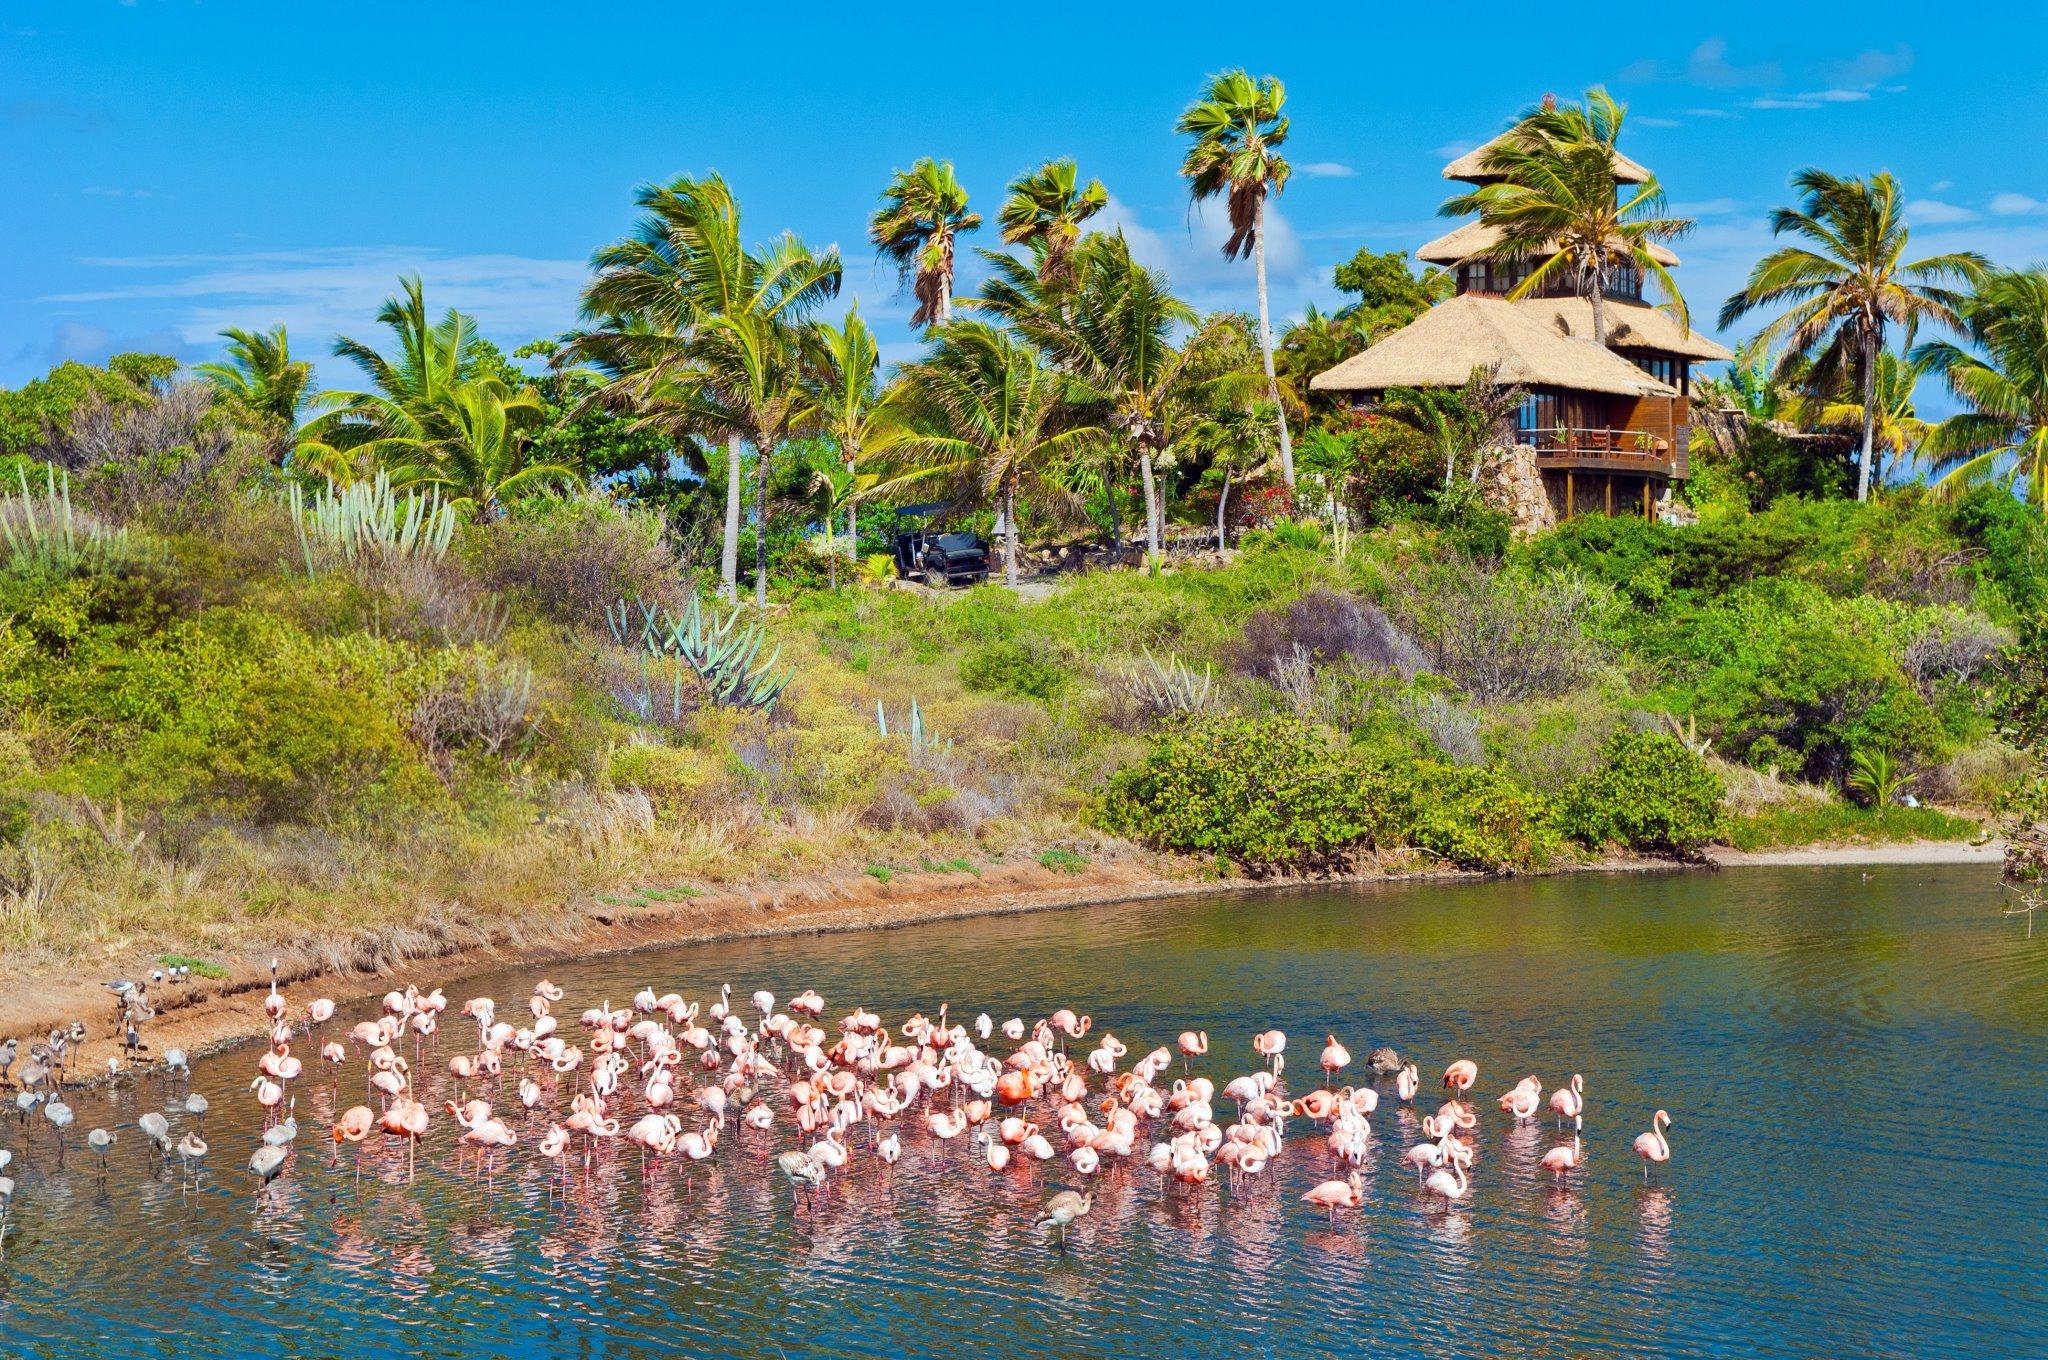 Necker flamingos